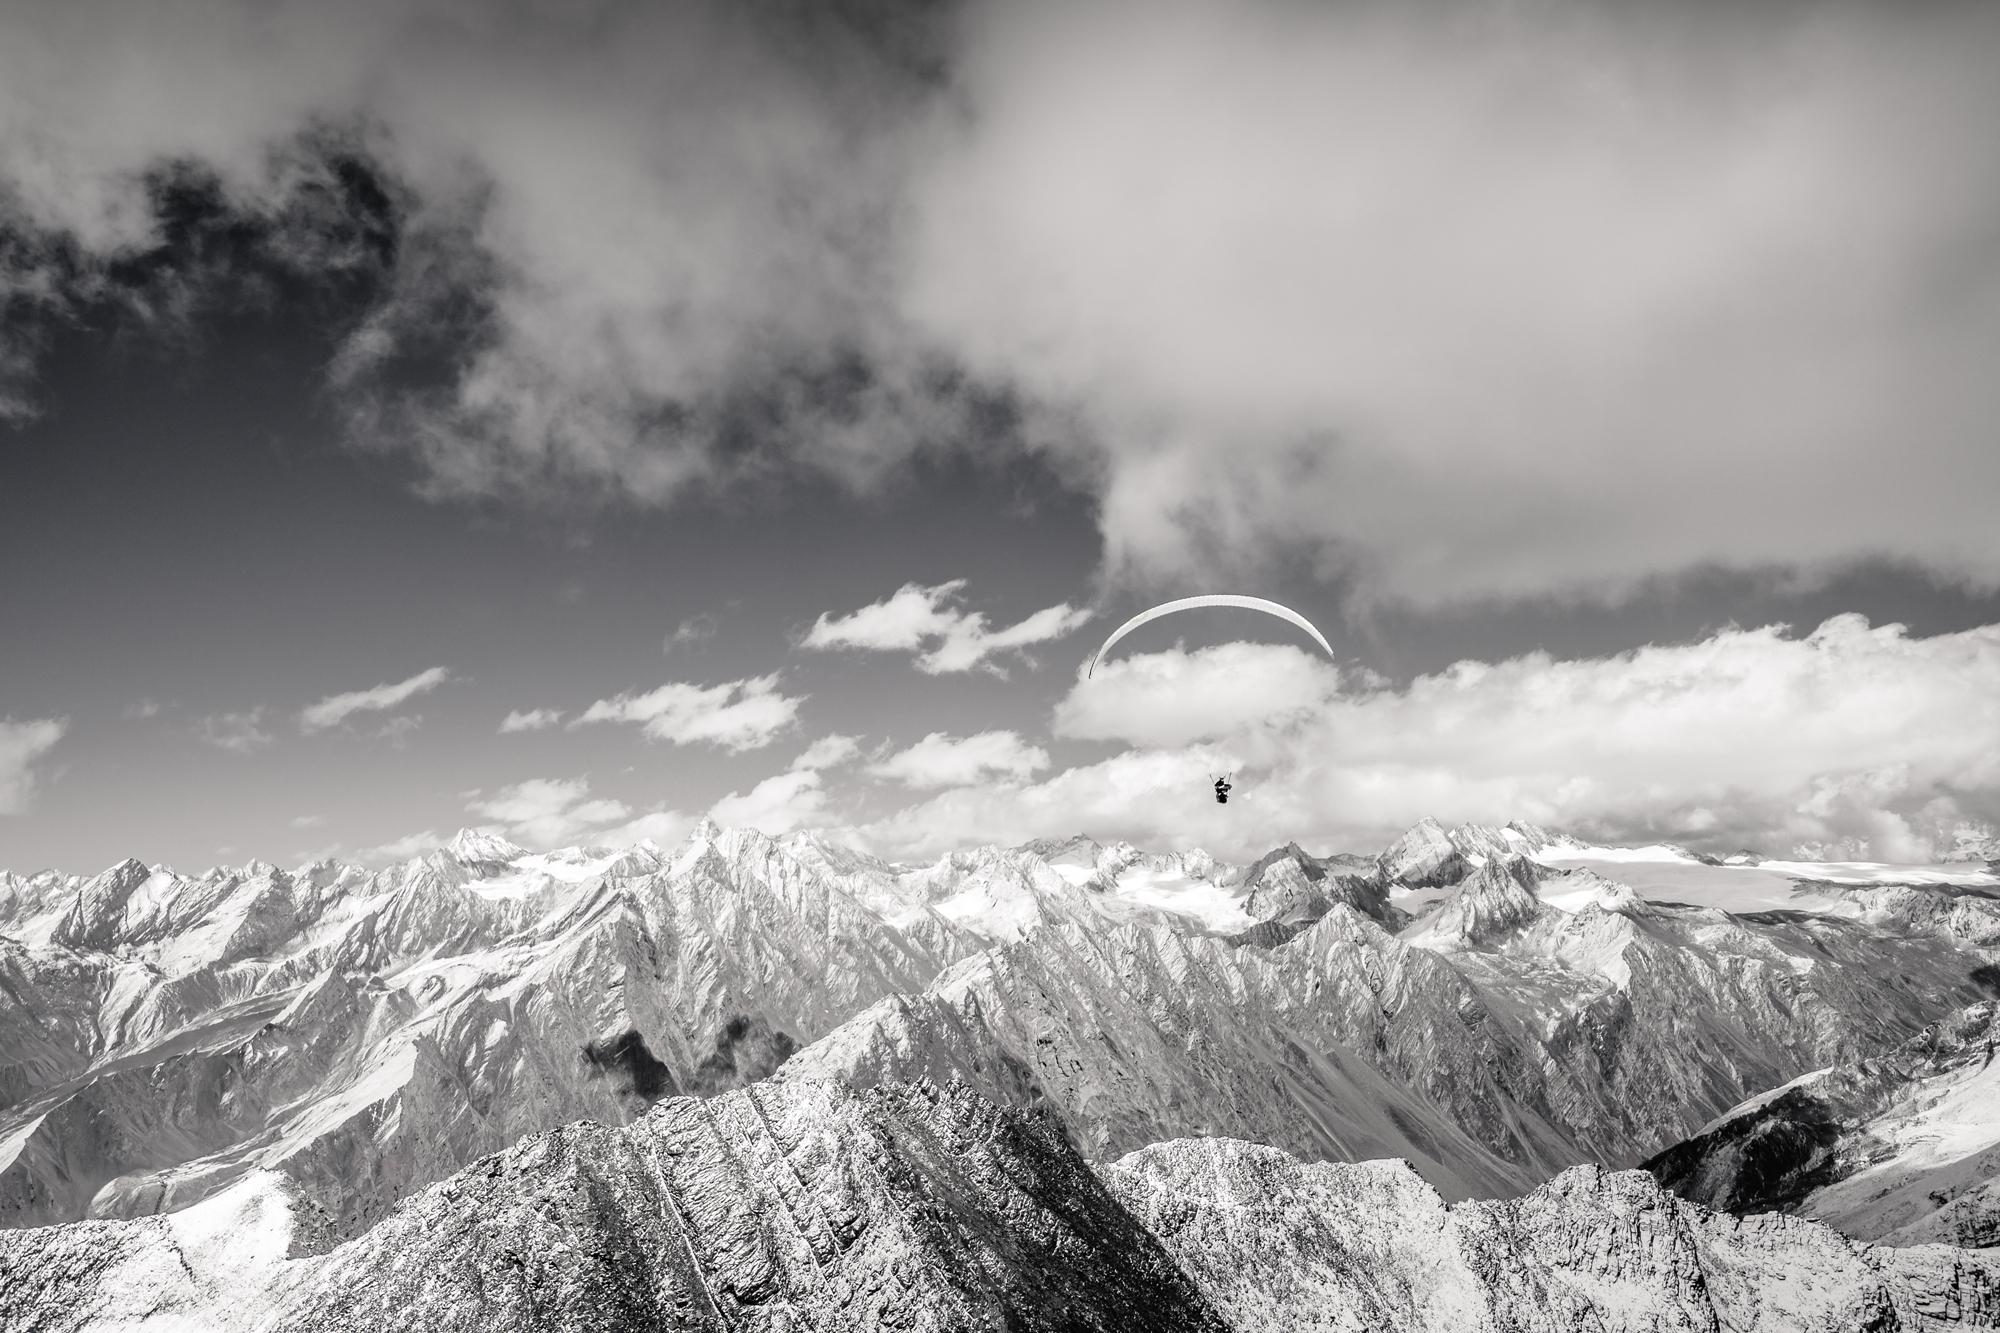 Francois ragolsi at 5000m in Himalaya Spice altirando